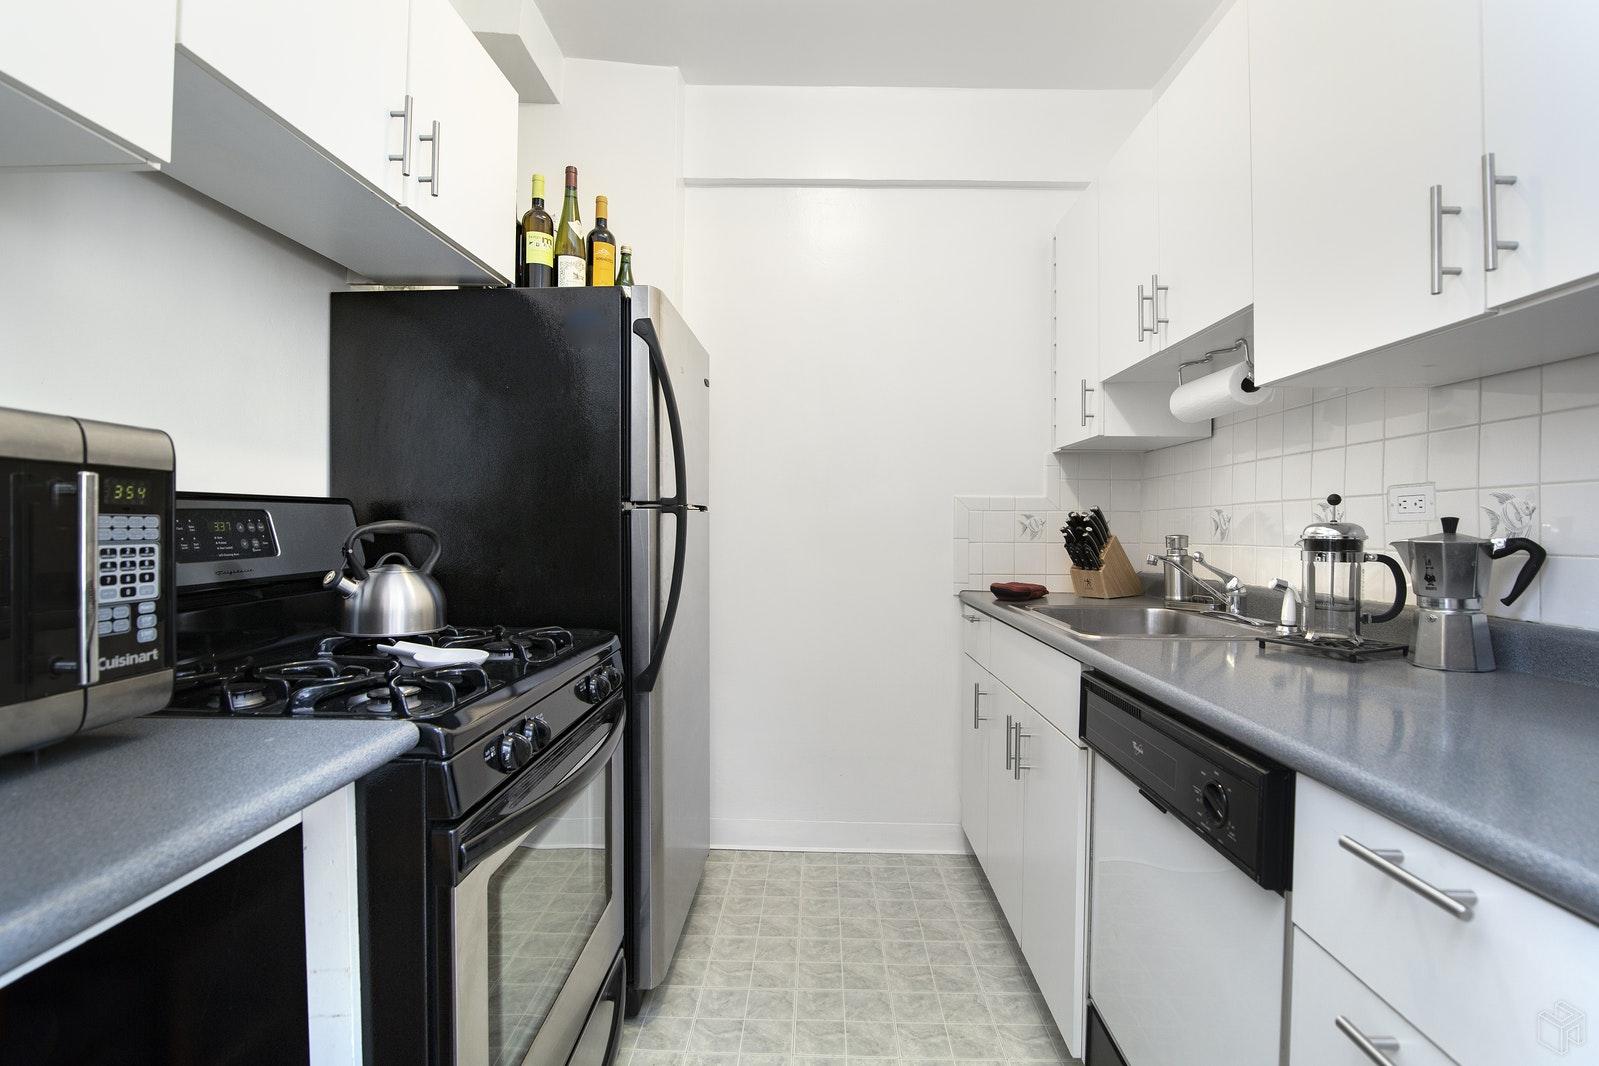 301 EAST 69TH STREET 15A, Upper East Side, $475,000, Web #: 19132446